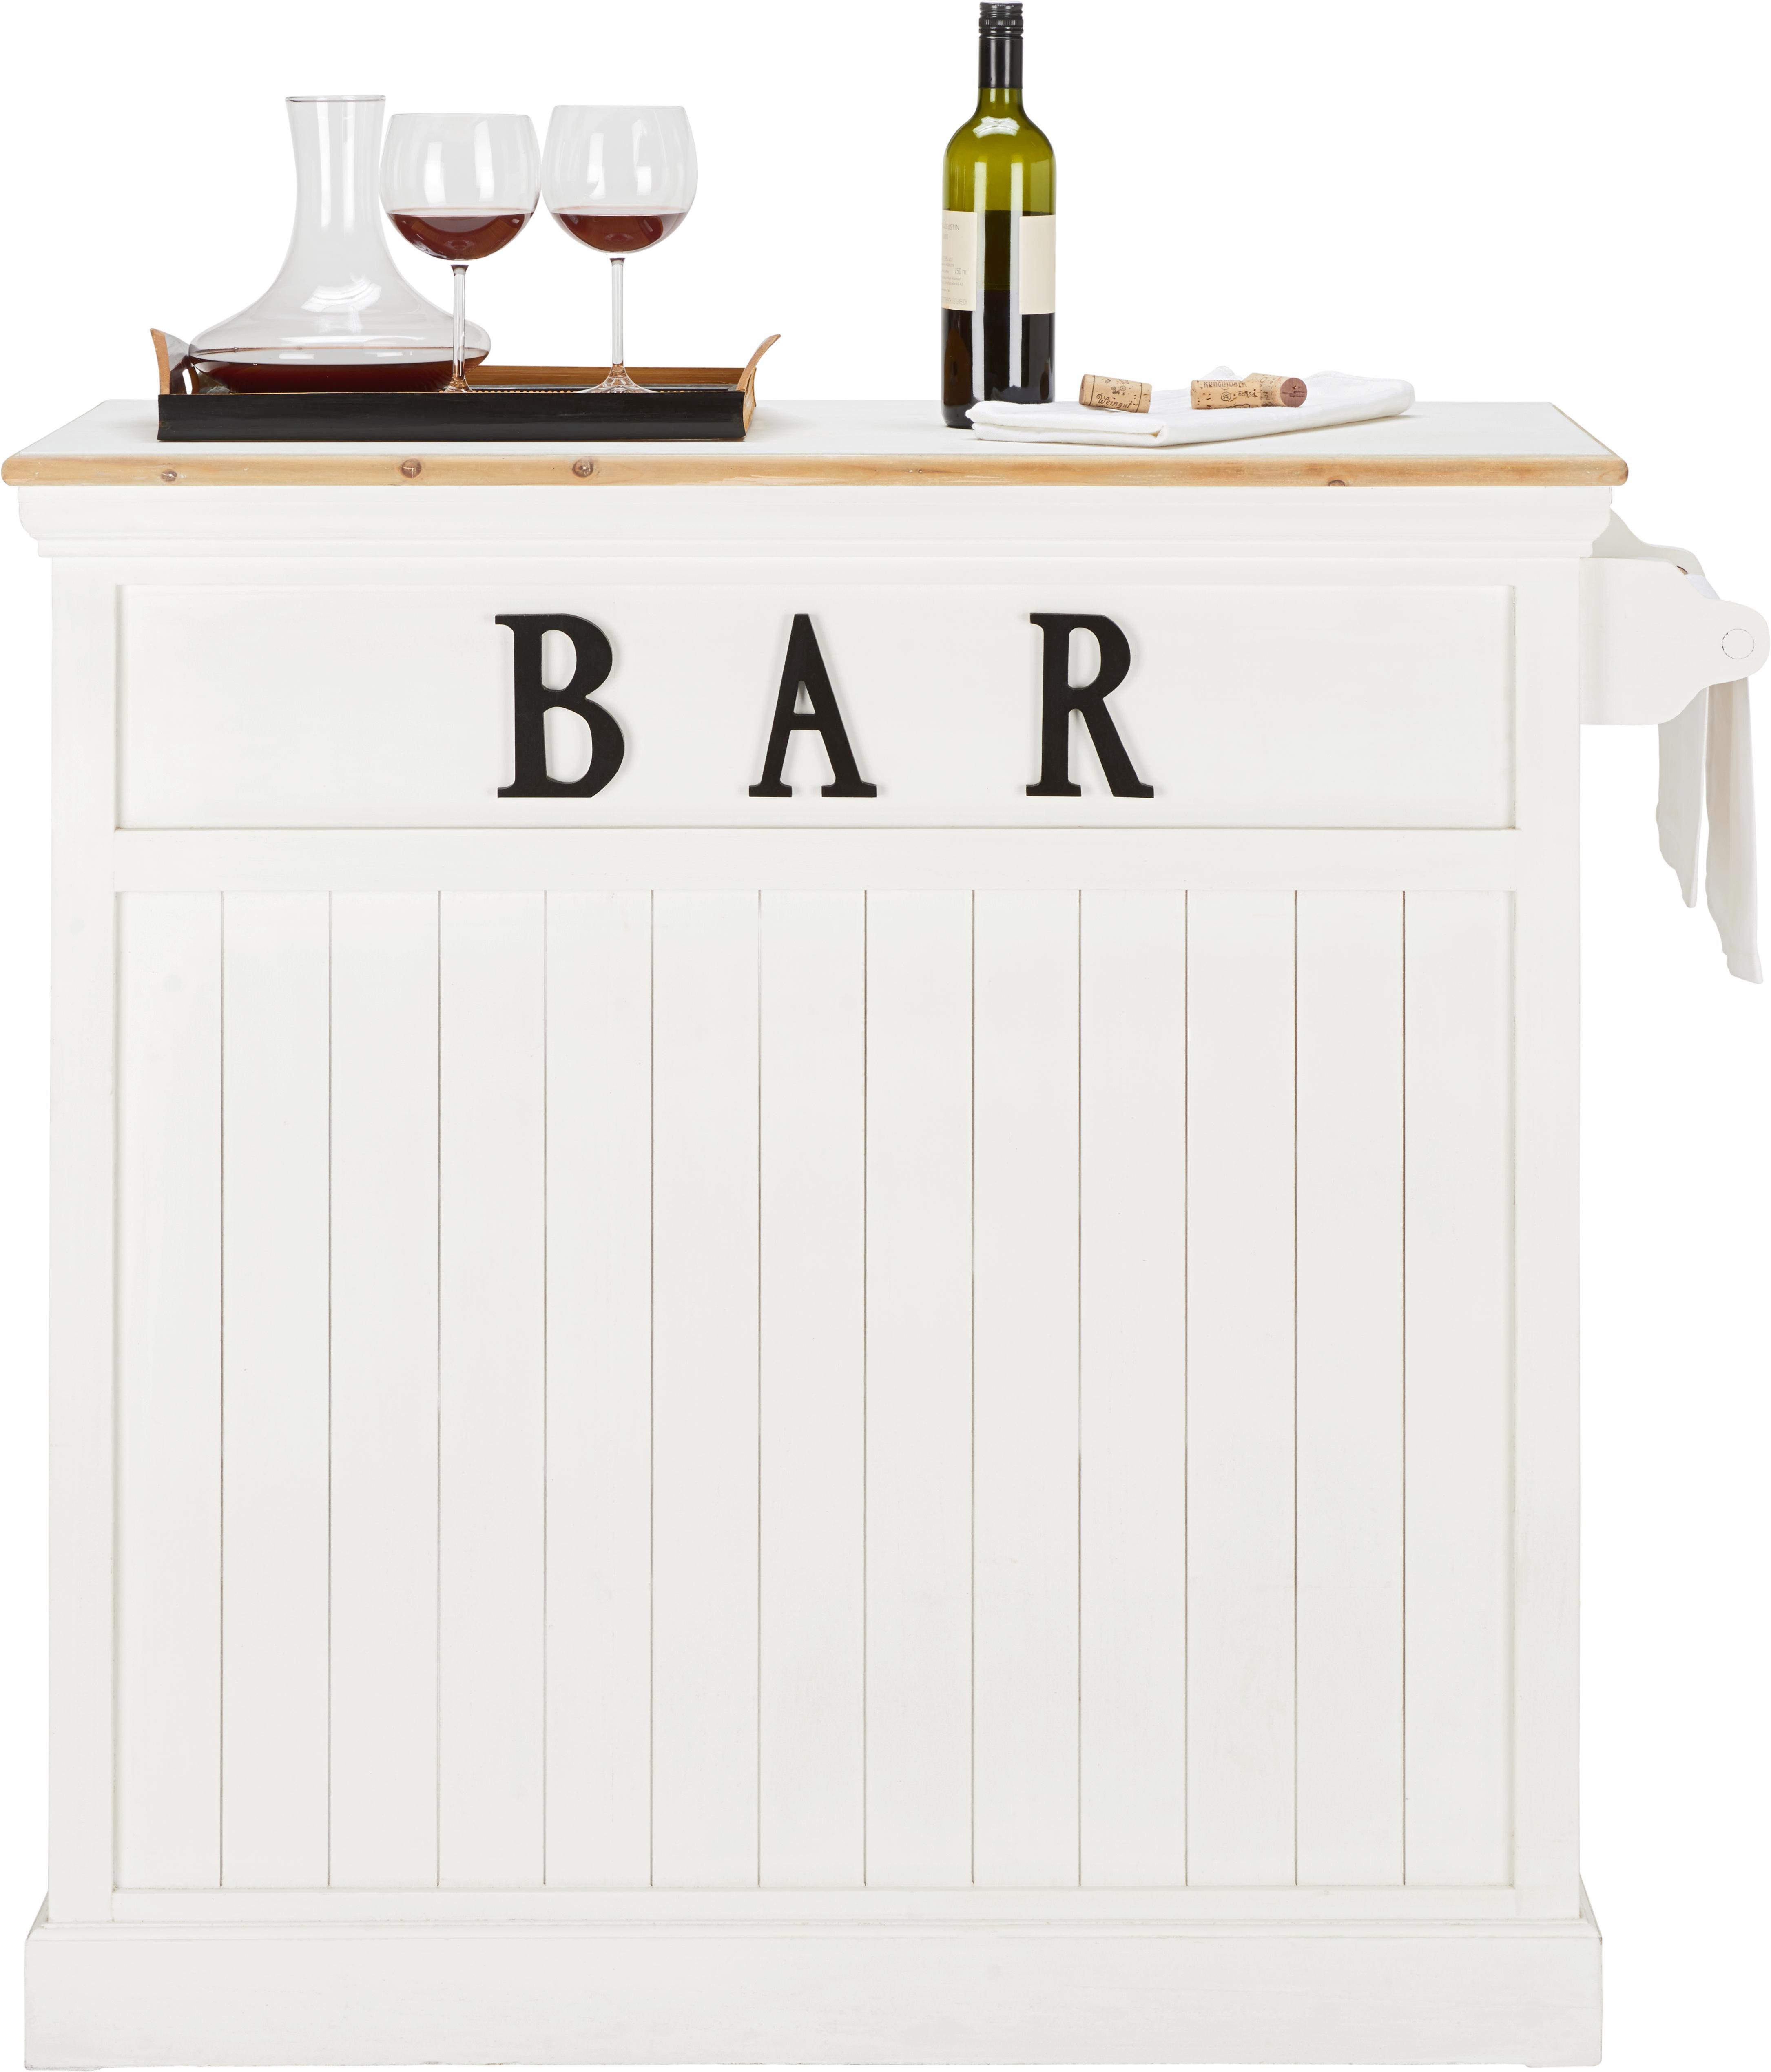 echtholz wei excellent amazing himmelbett holz wei x aus kiefer massivholz mit schn verziertes. Black Bedroom Furniture Sets. Home Design Ideas